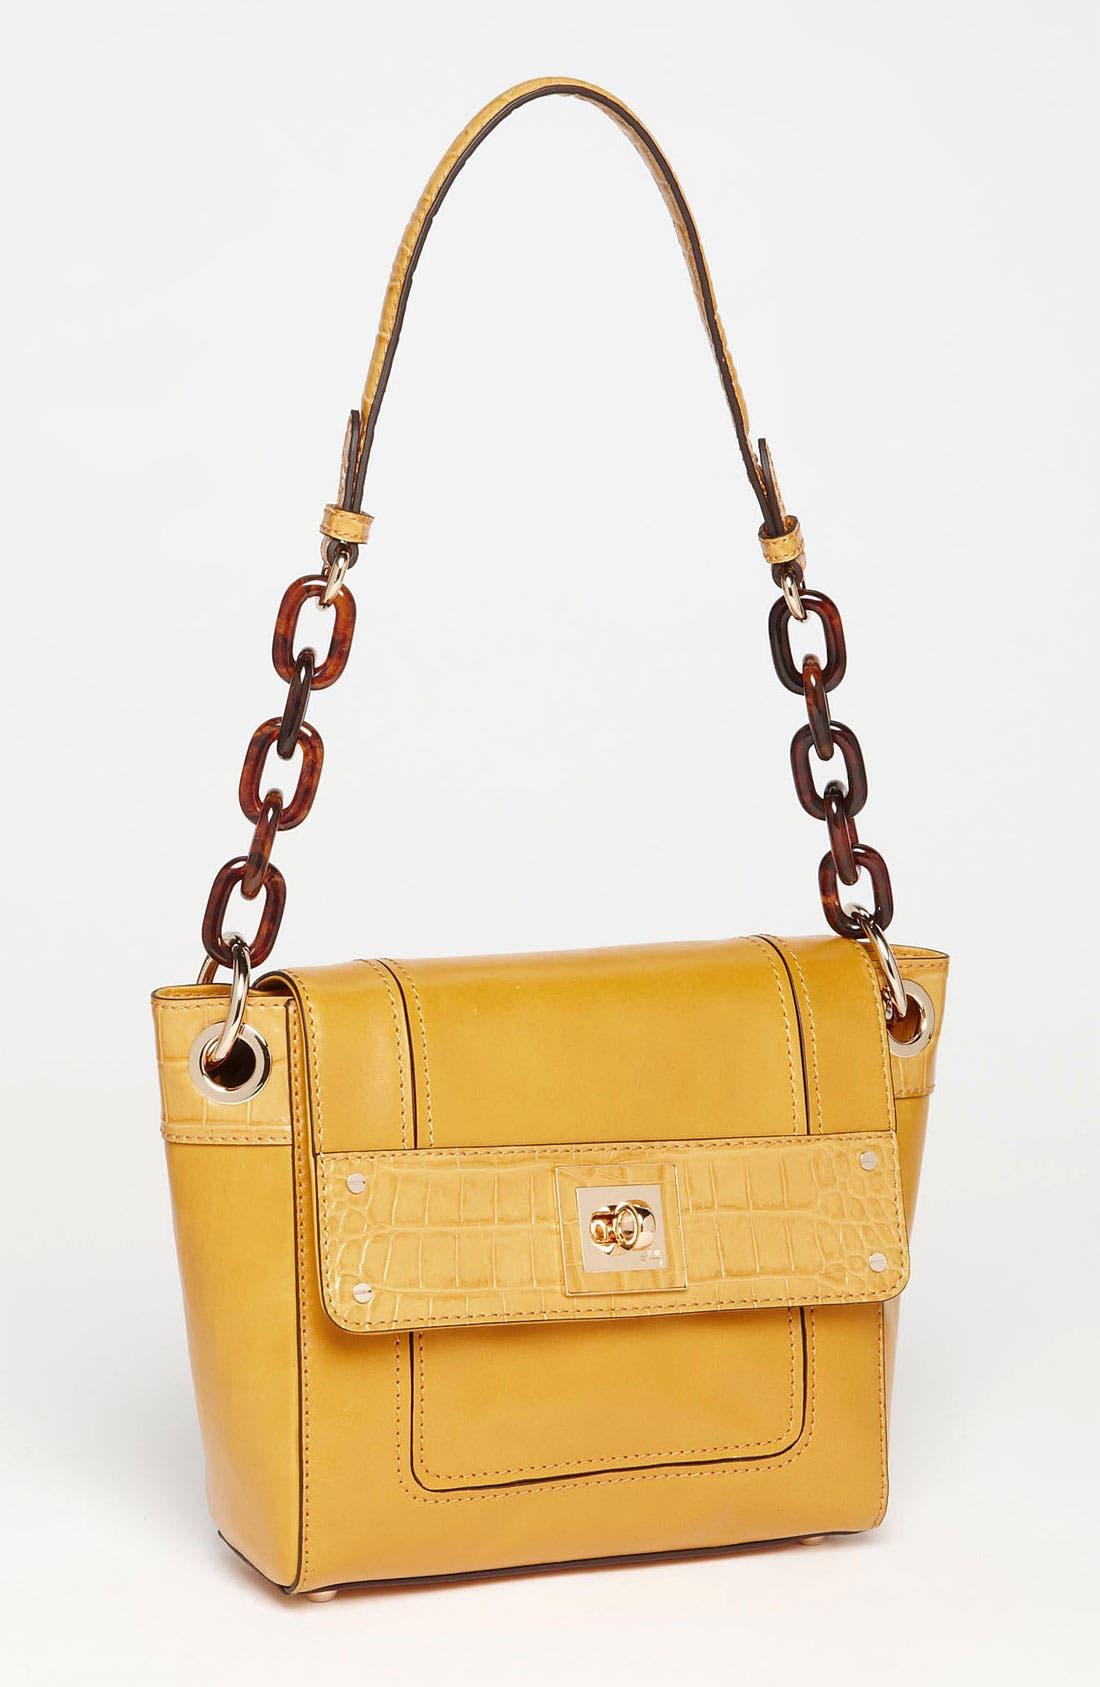 Main Image - Milly 'Amelia' Shoulder Bag with Croc Embossed Trim